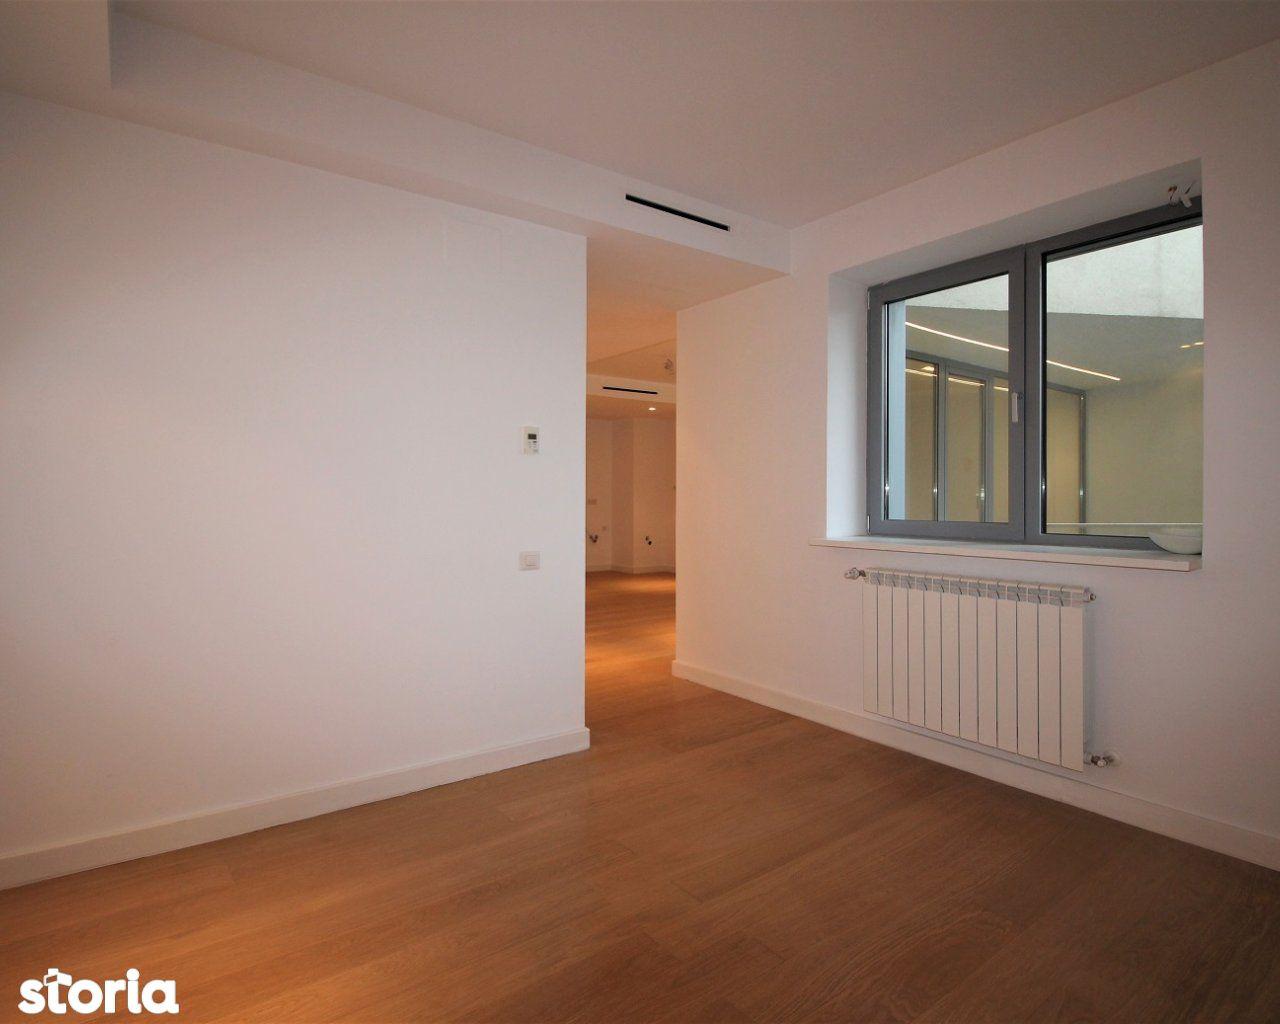 Apartament de vanzare, București (judet), Strada Sfinții Voievozi - Foto 9